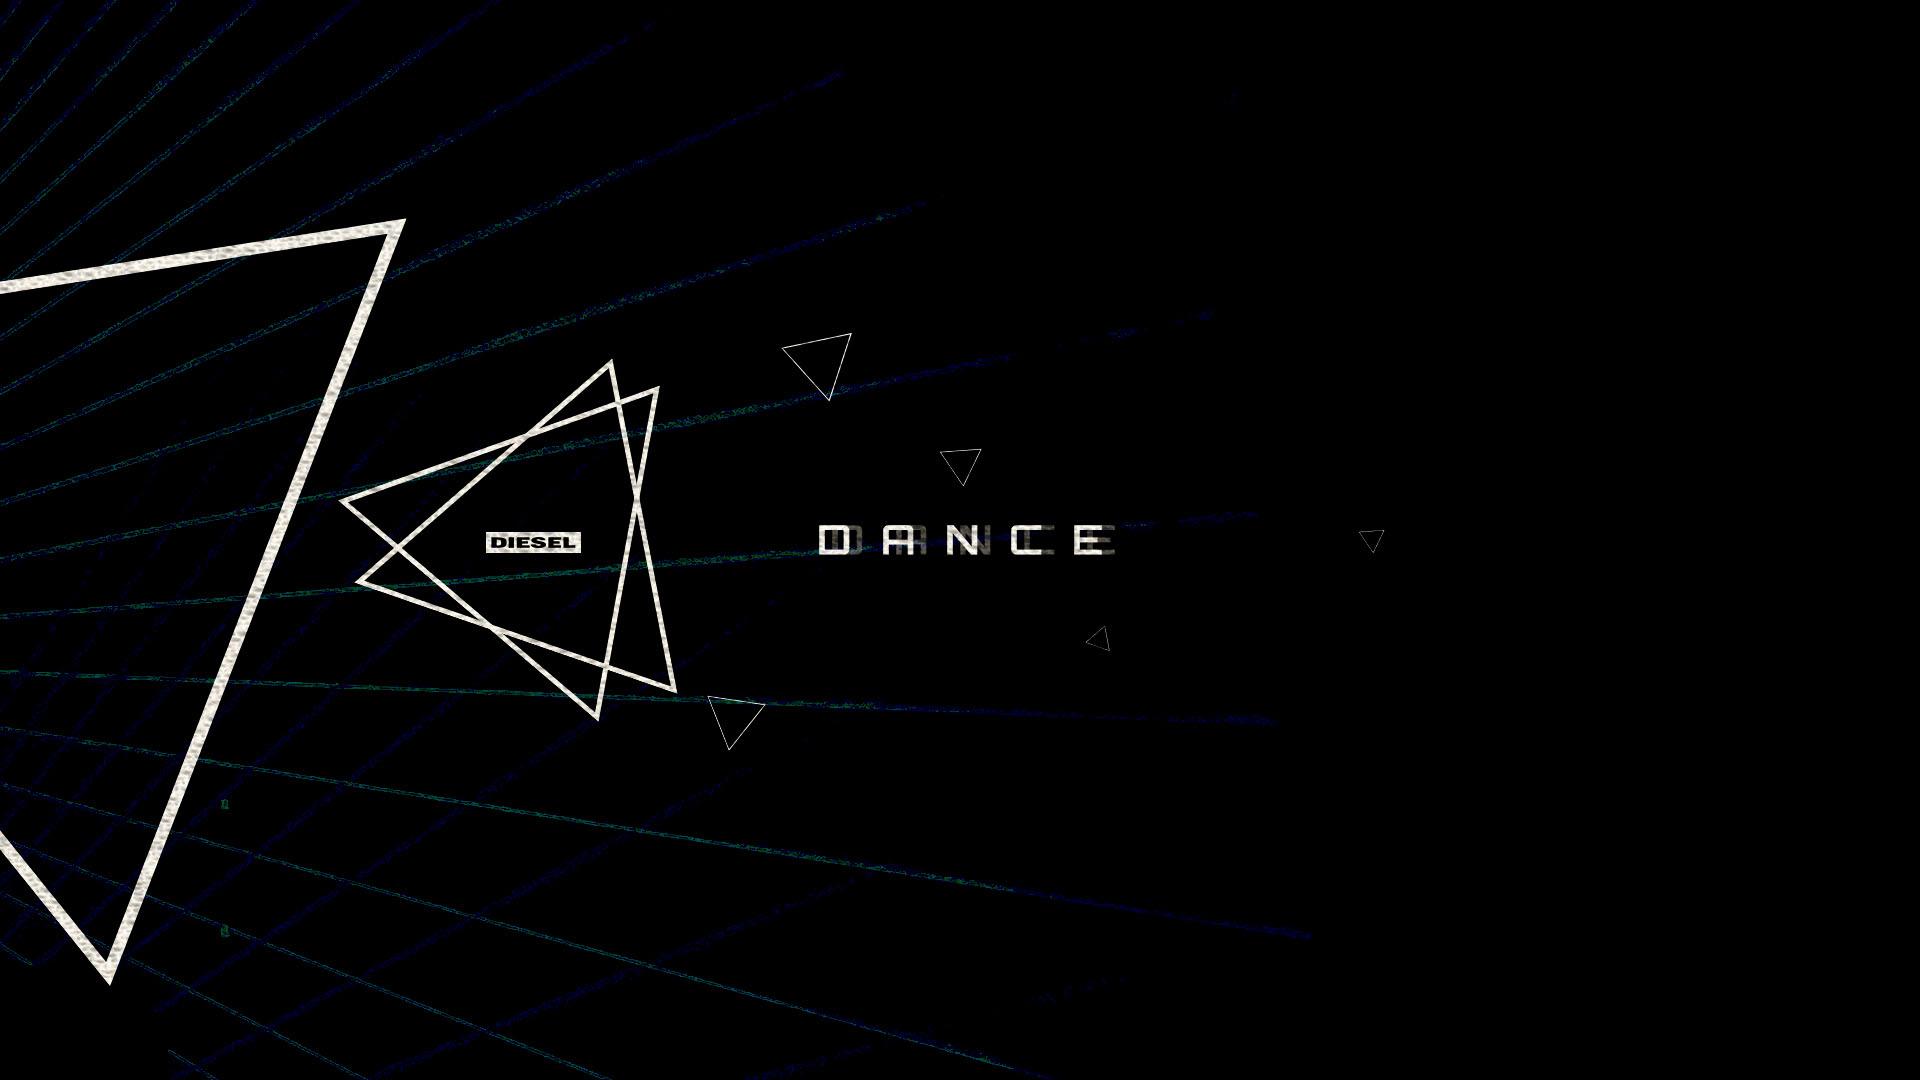 04_diesel_dance_planet_frame_01.jpg